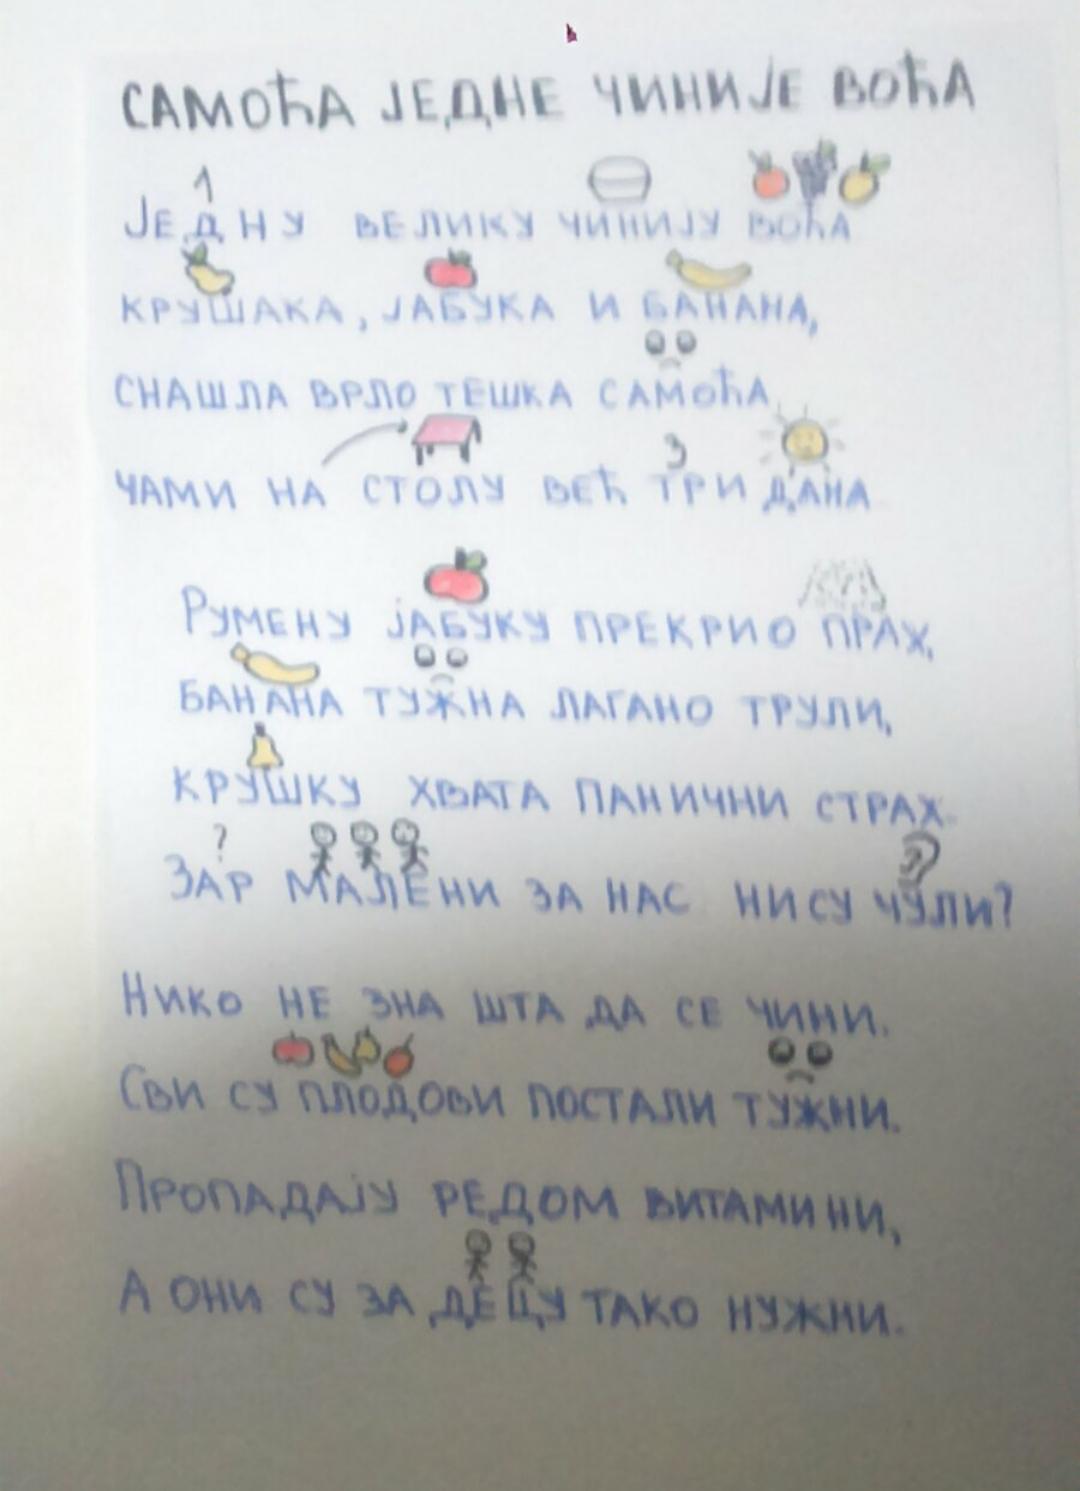 recitacija_voce